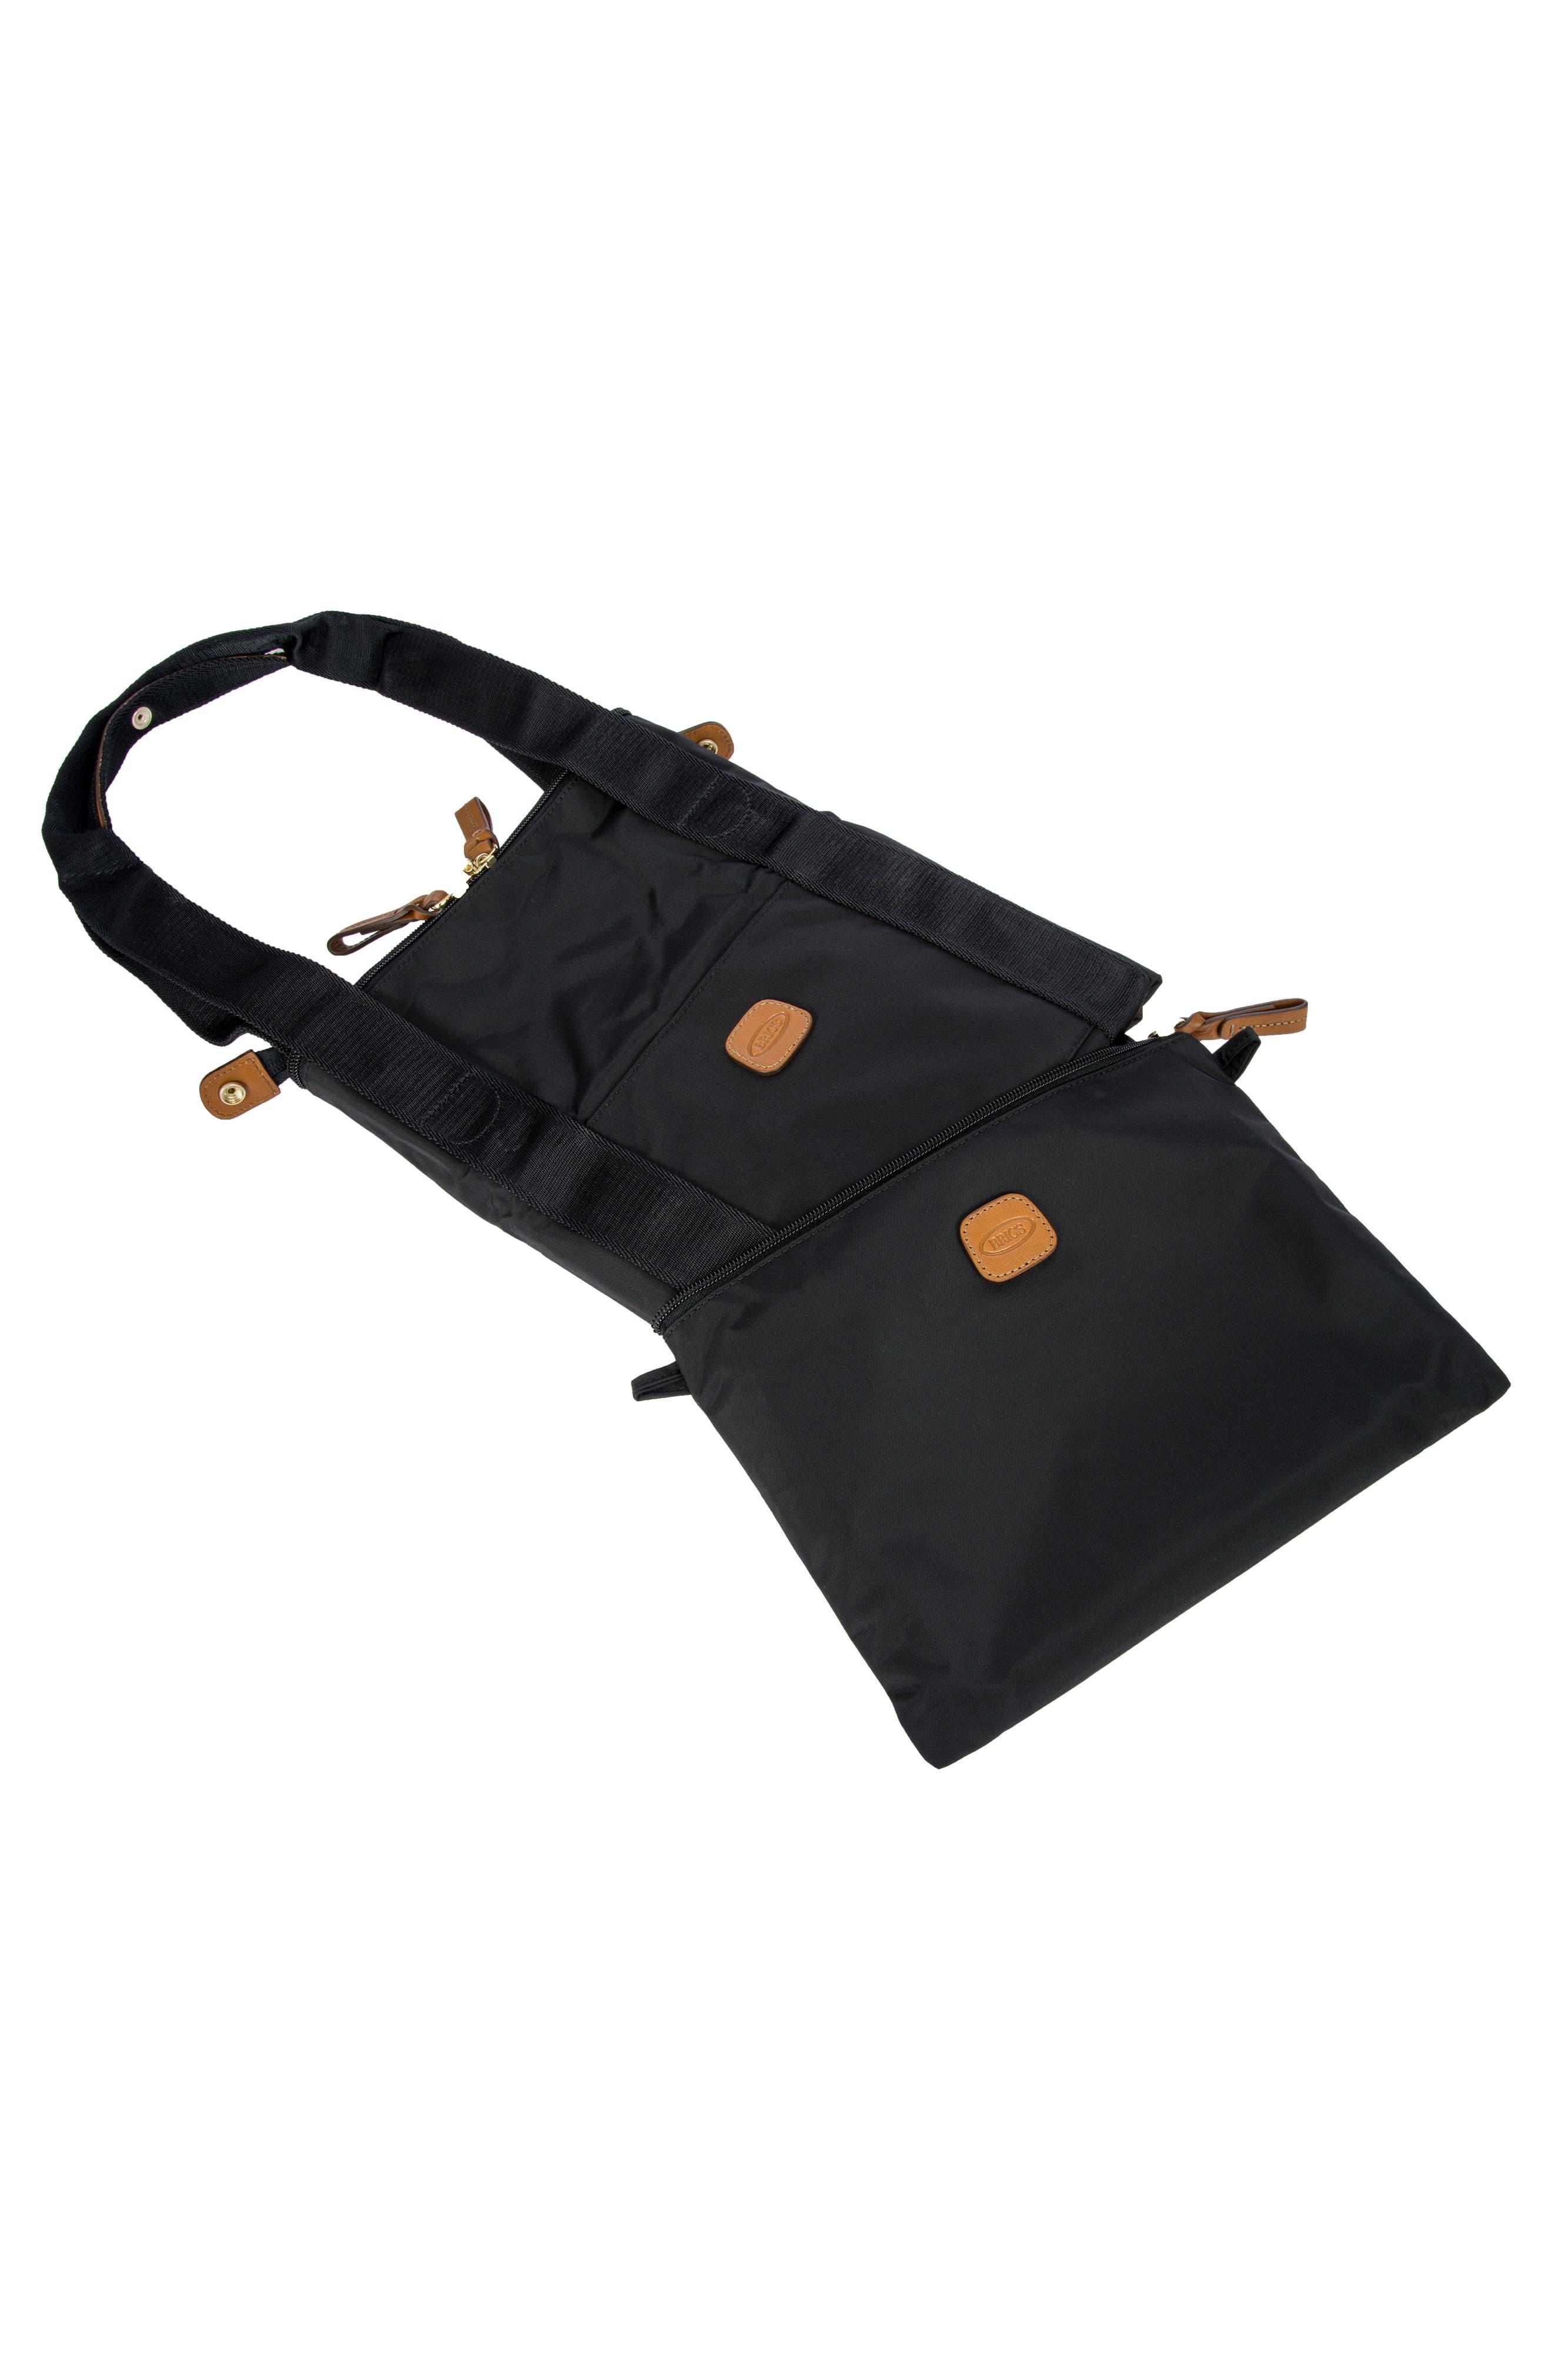 X-Bag 22-Inch Folding Duffel Bag,                             Alternate thumbnail 7, color,                             BLACK